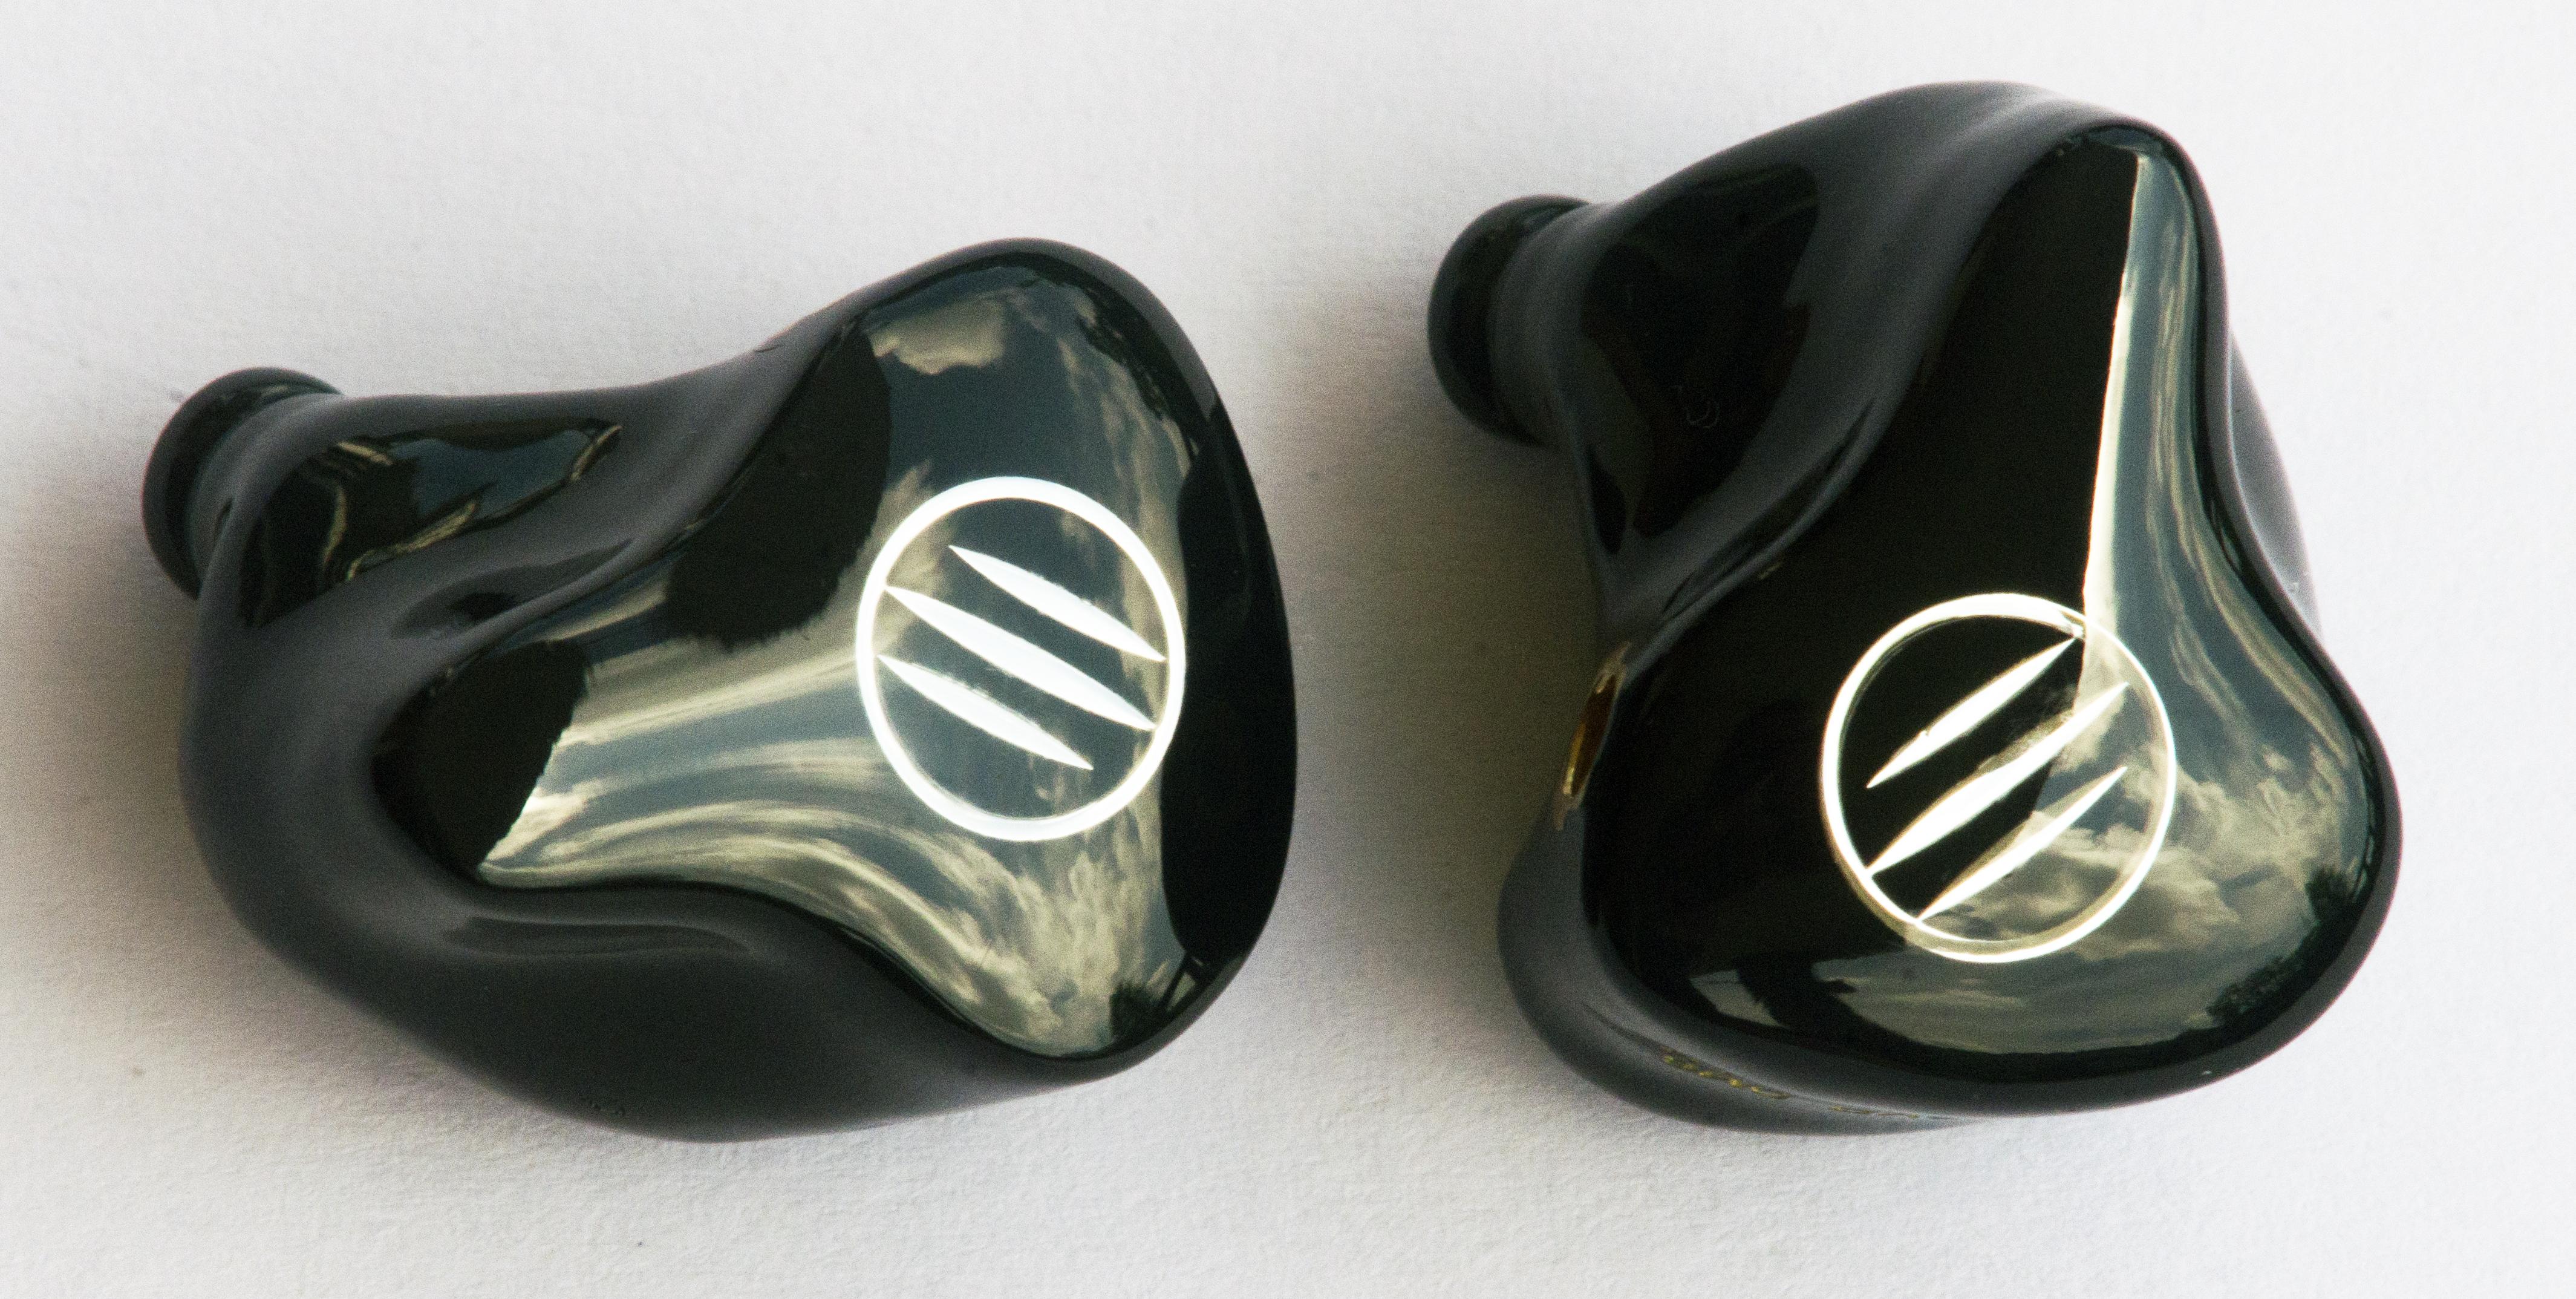 dh6 black.jpg